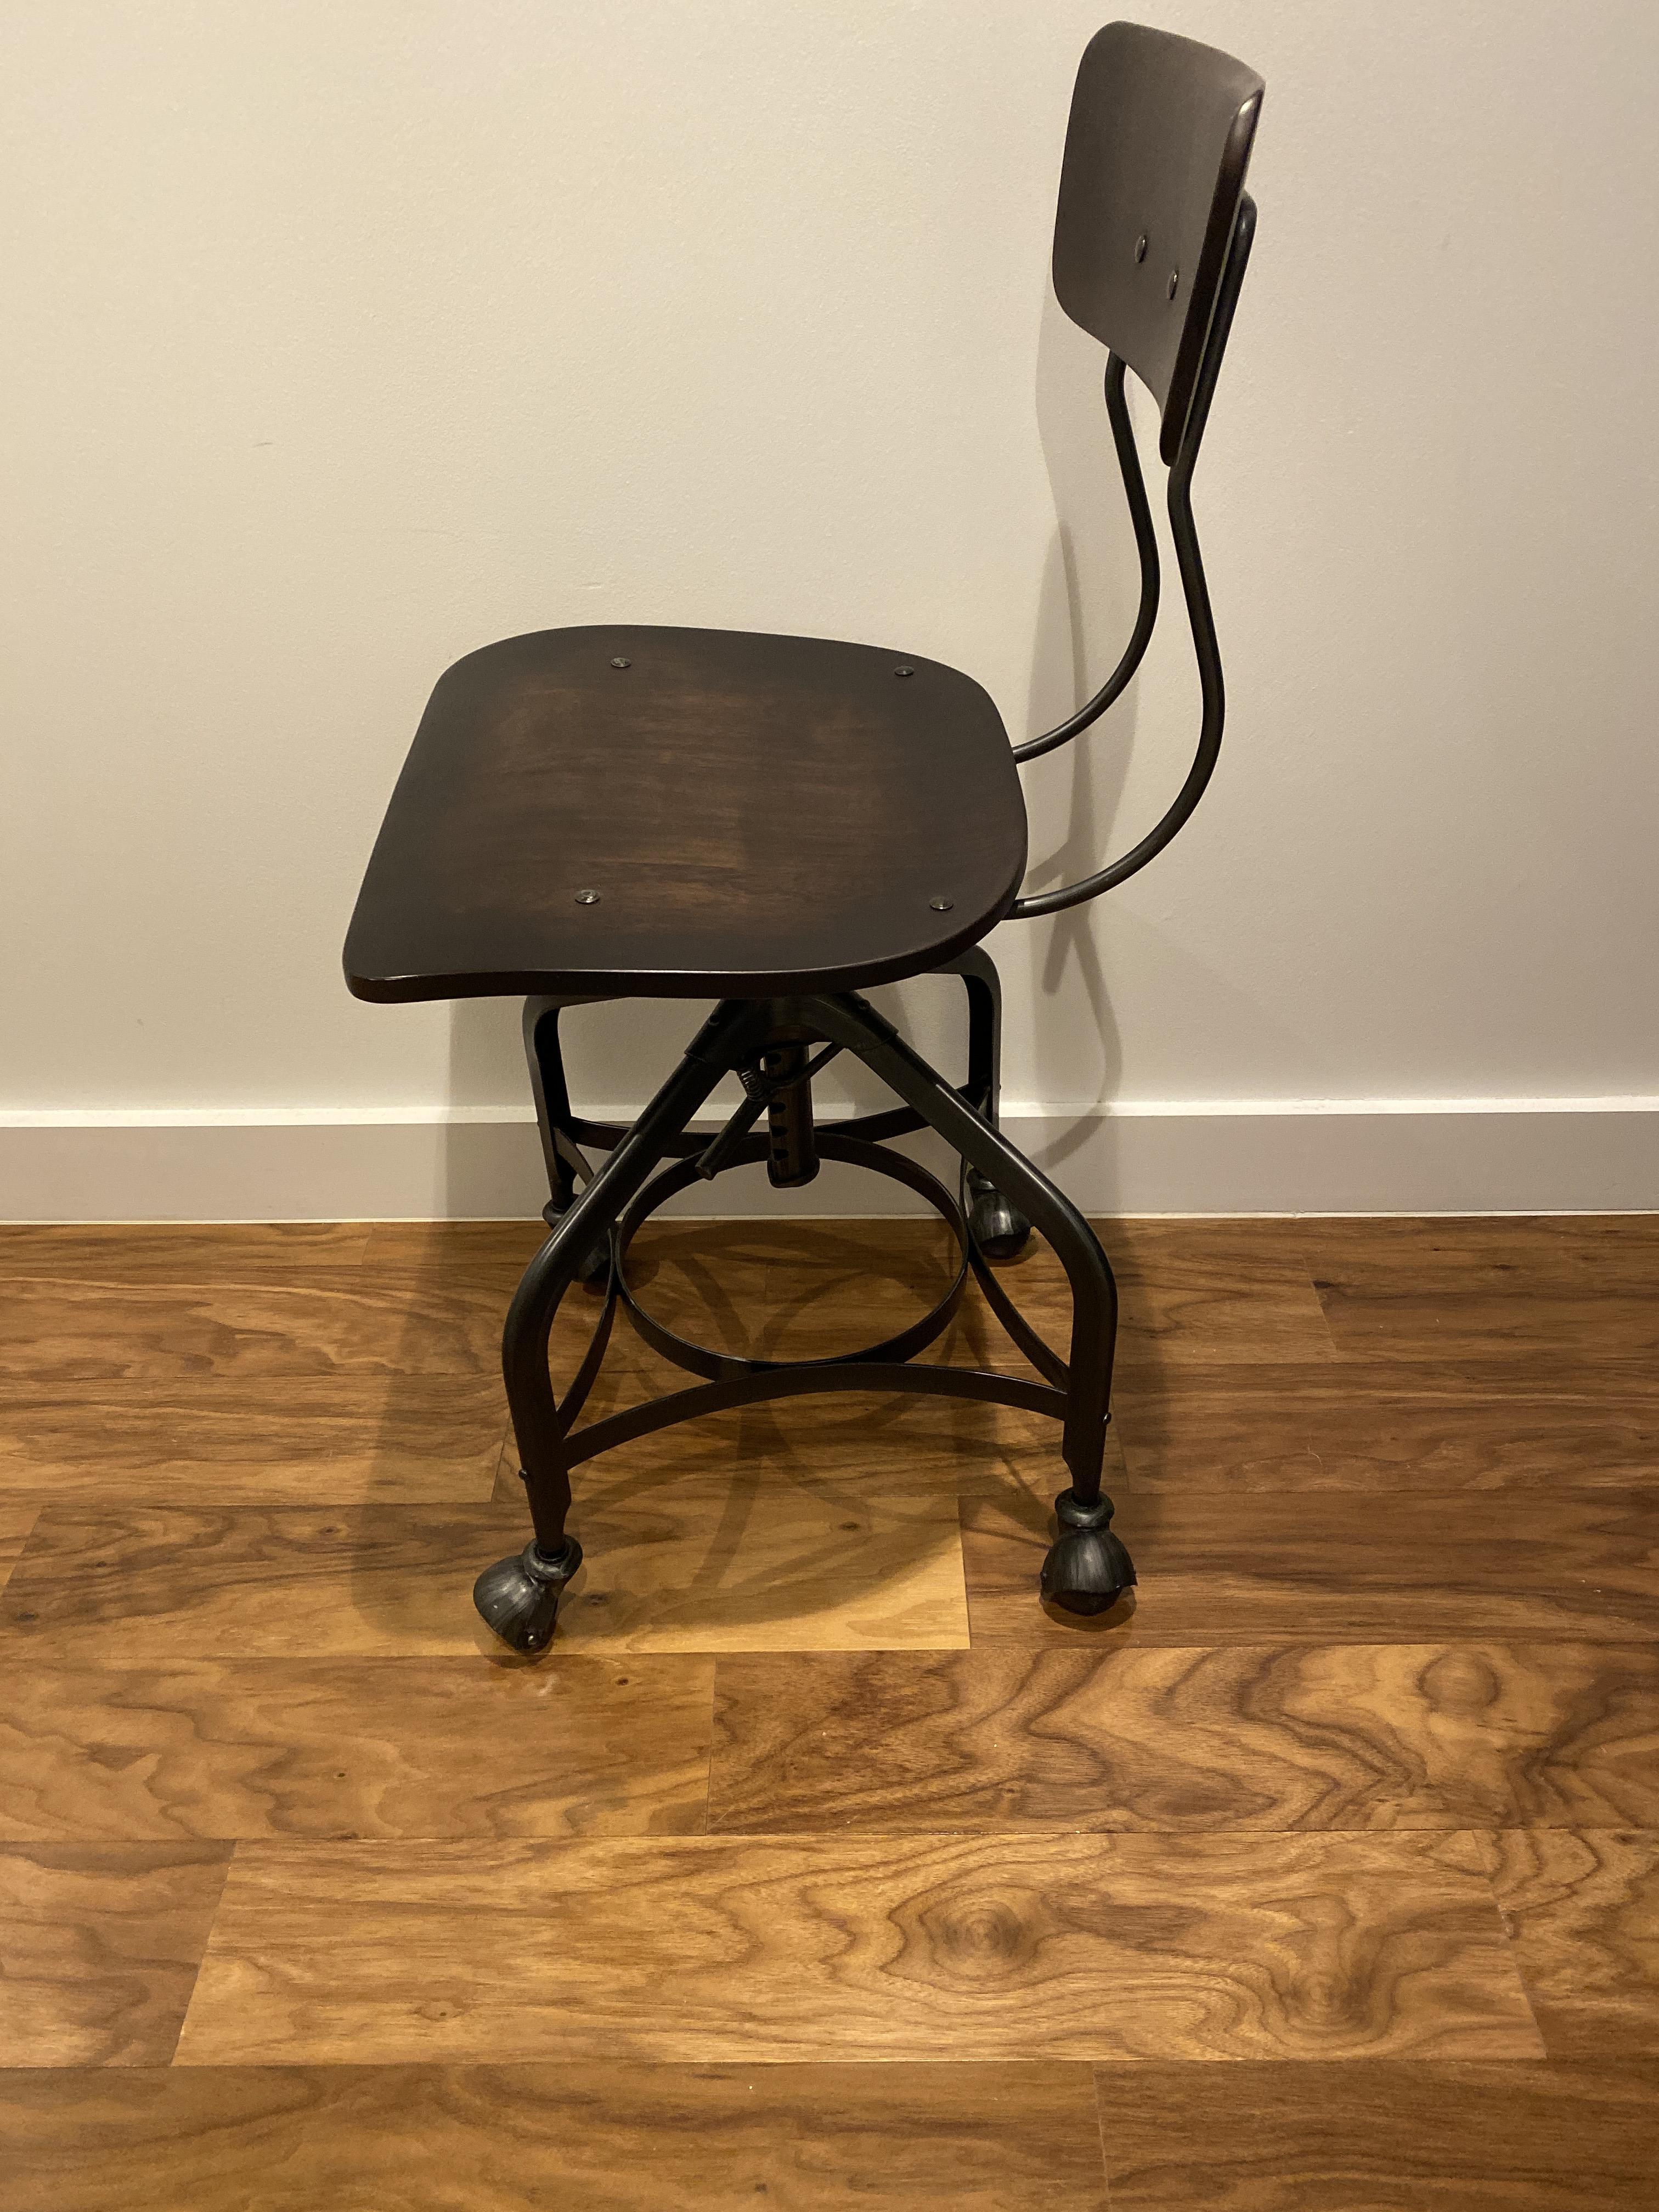 Restoration Hardware Vintage Toledo Desk Chair w/ Casters